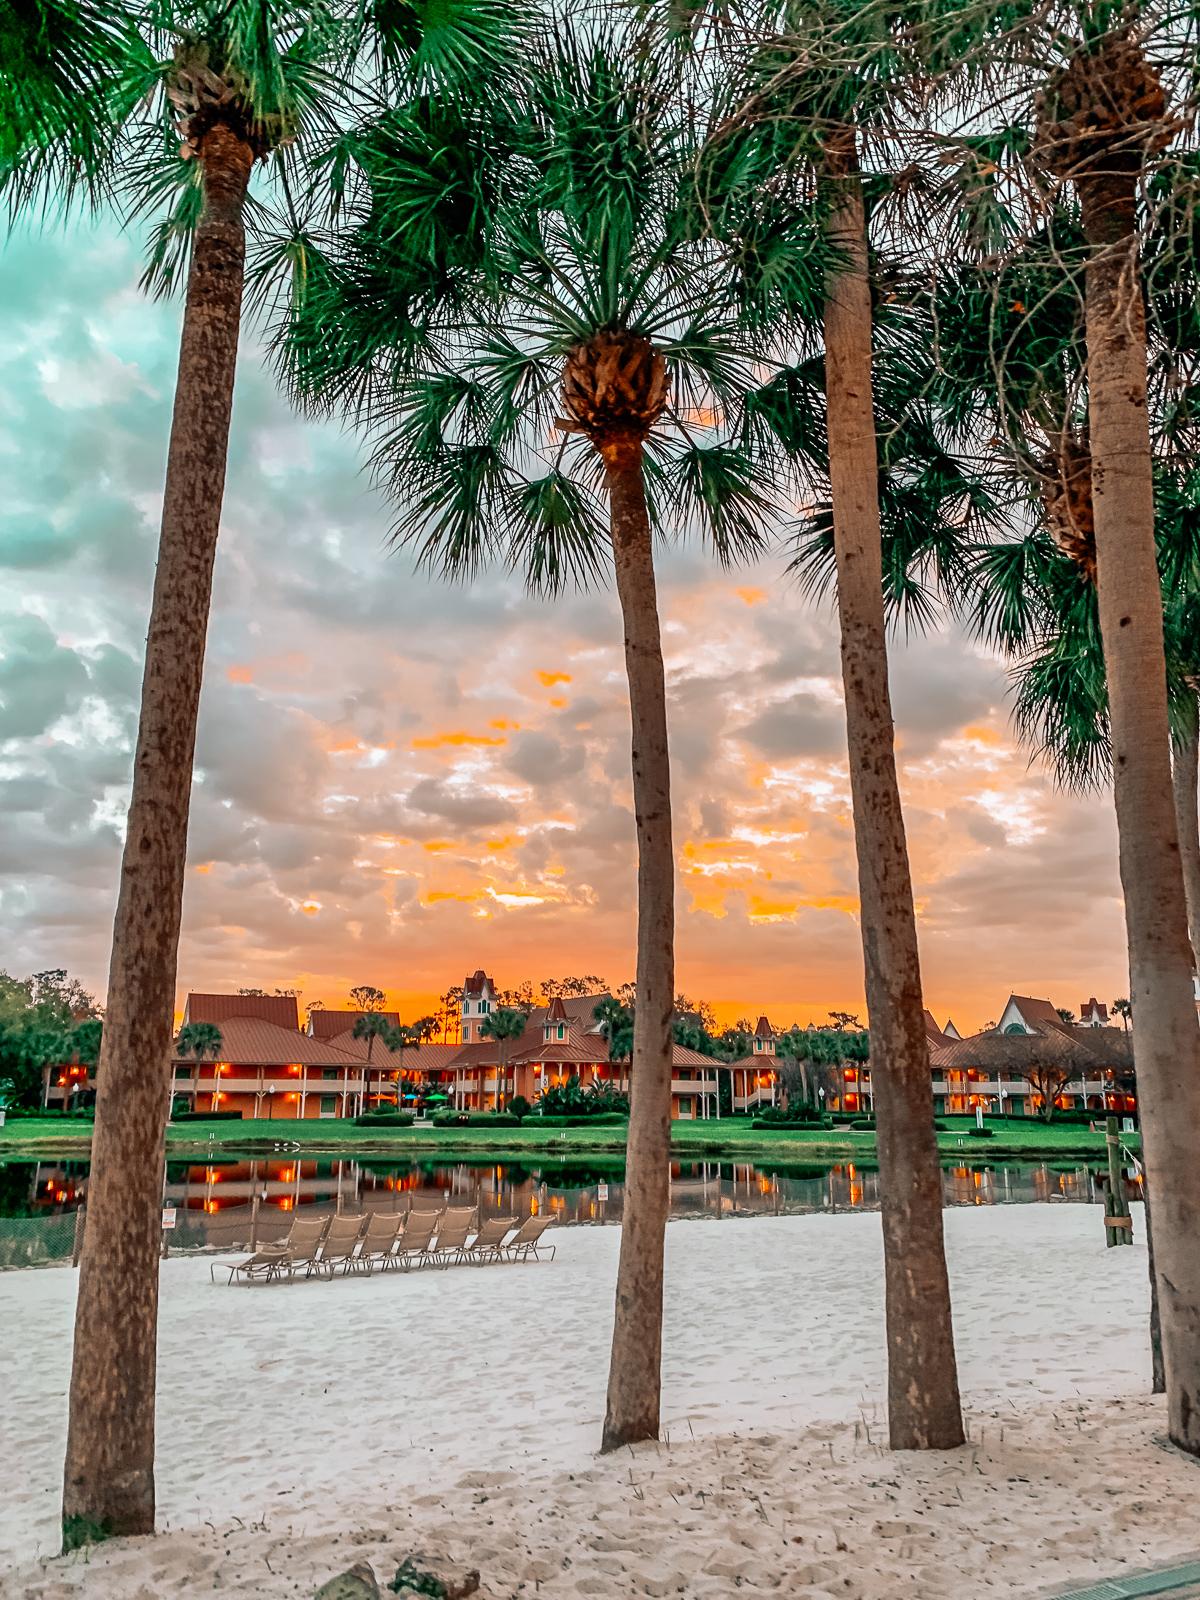 The Ultimate Week Walt Disney World Itinerary Travel Caribbean Resort